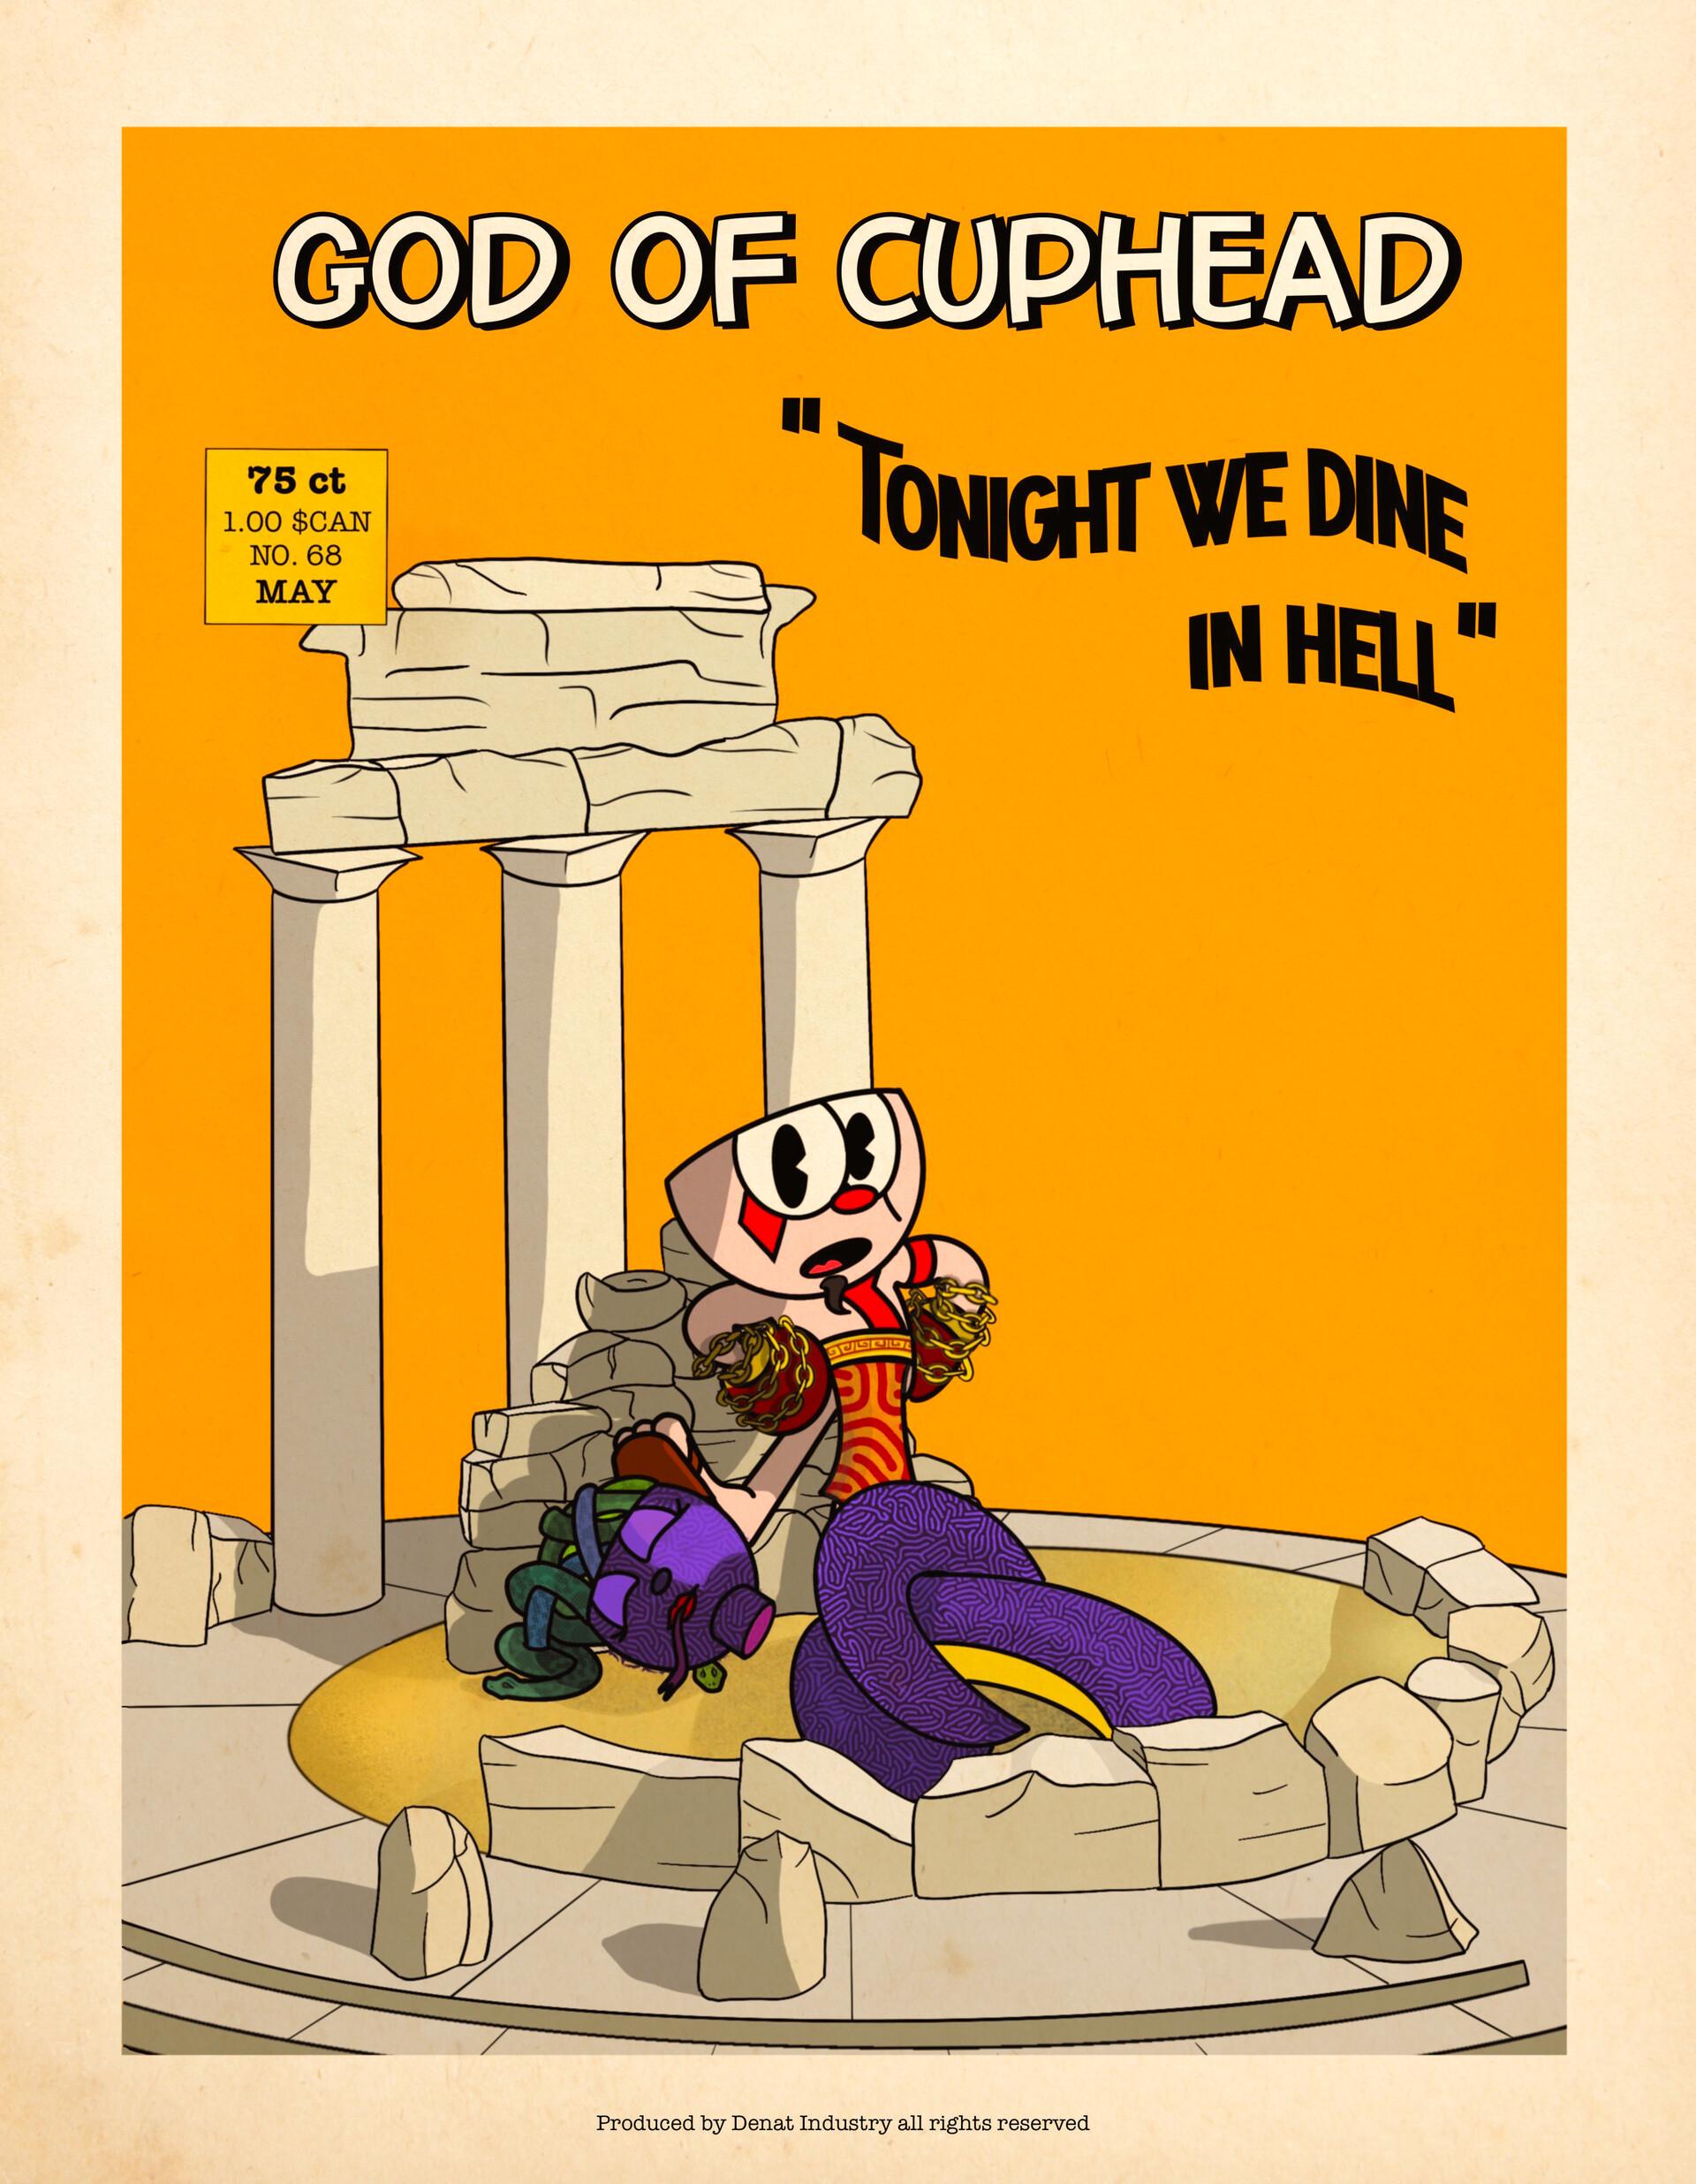 God of Cuphead